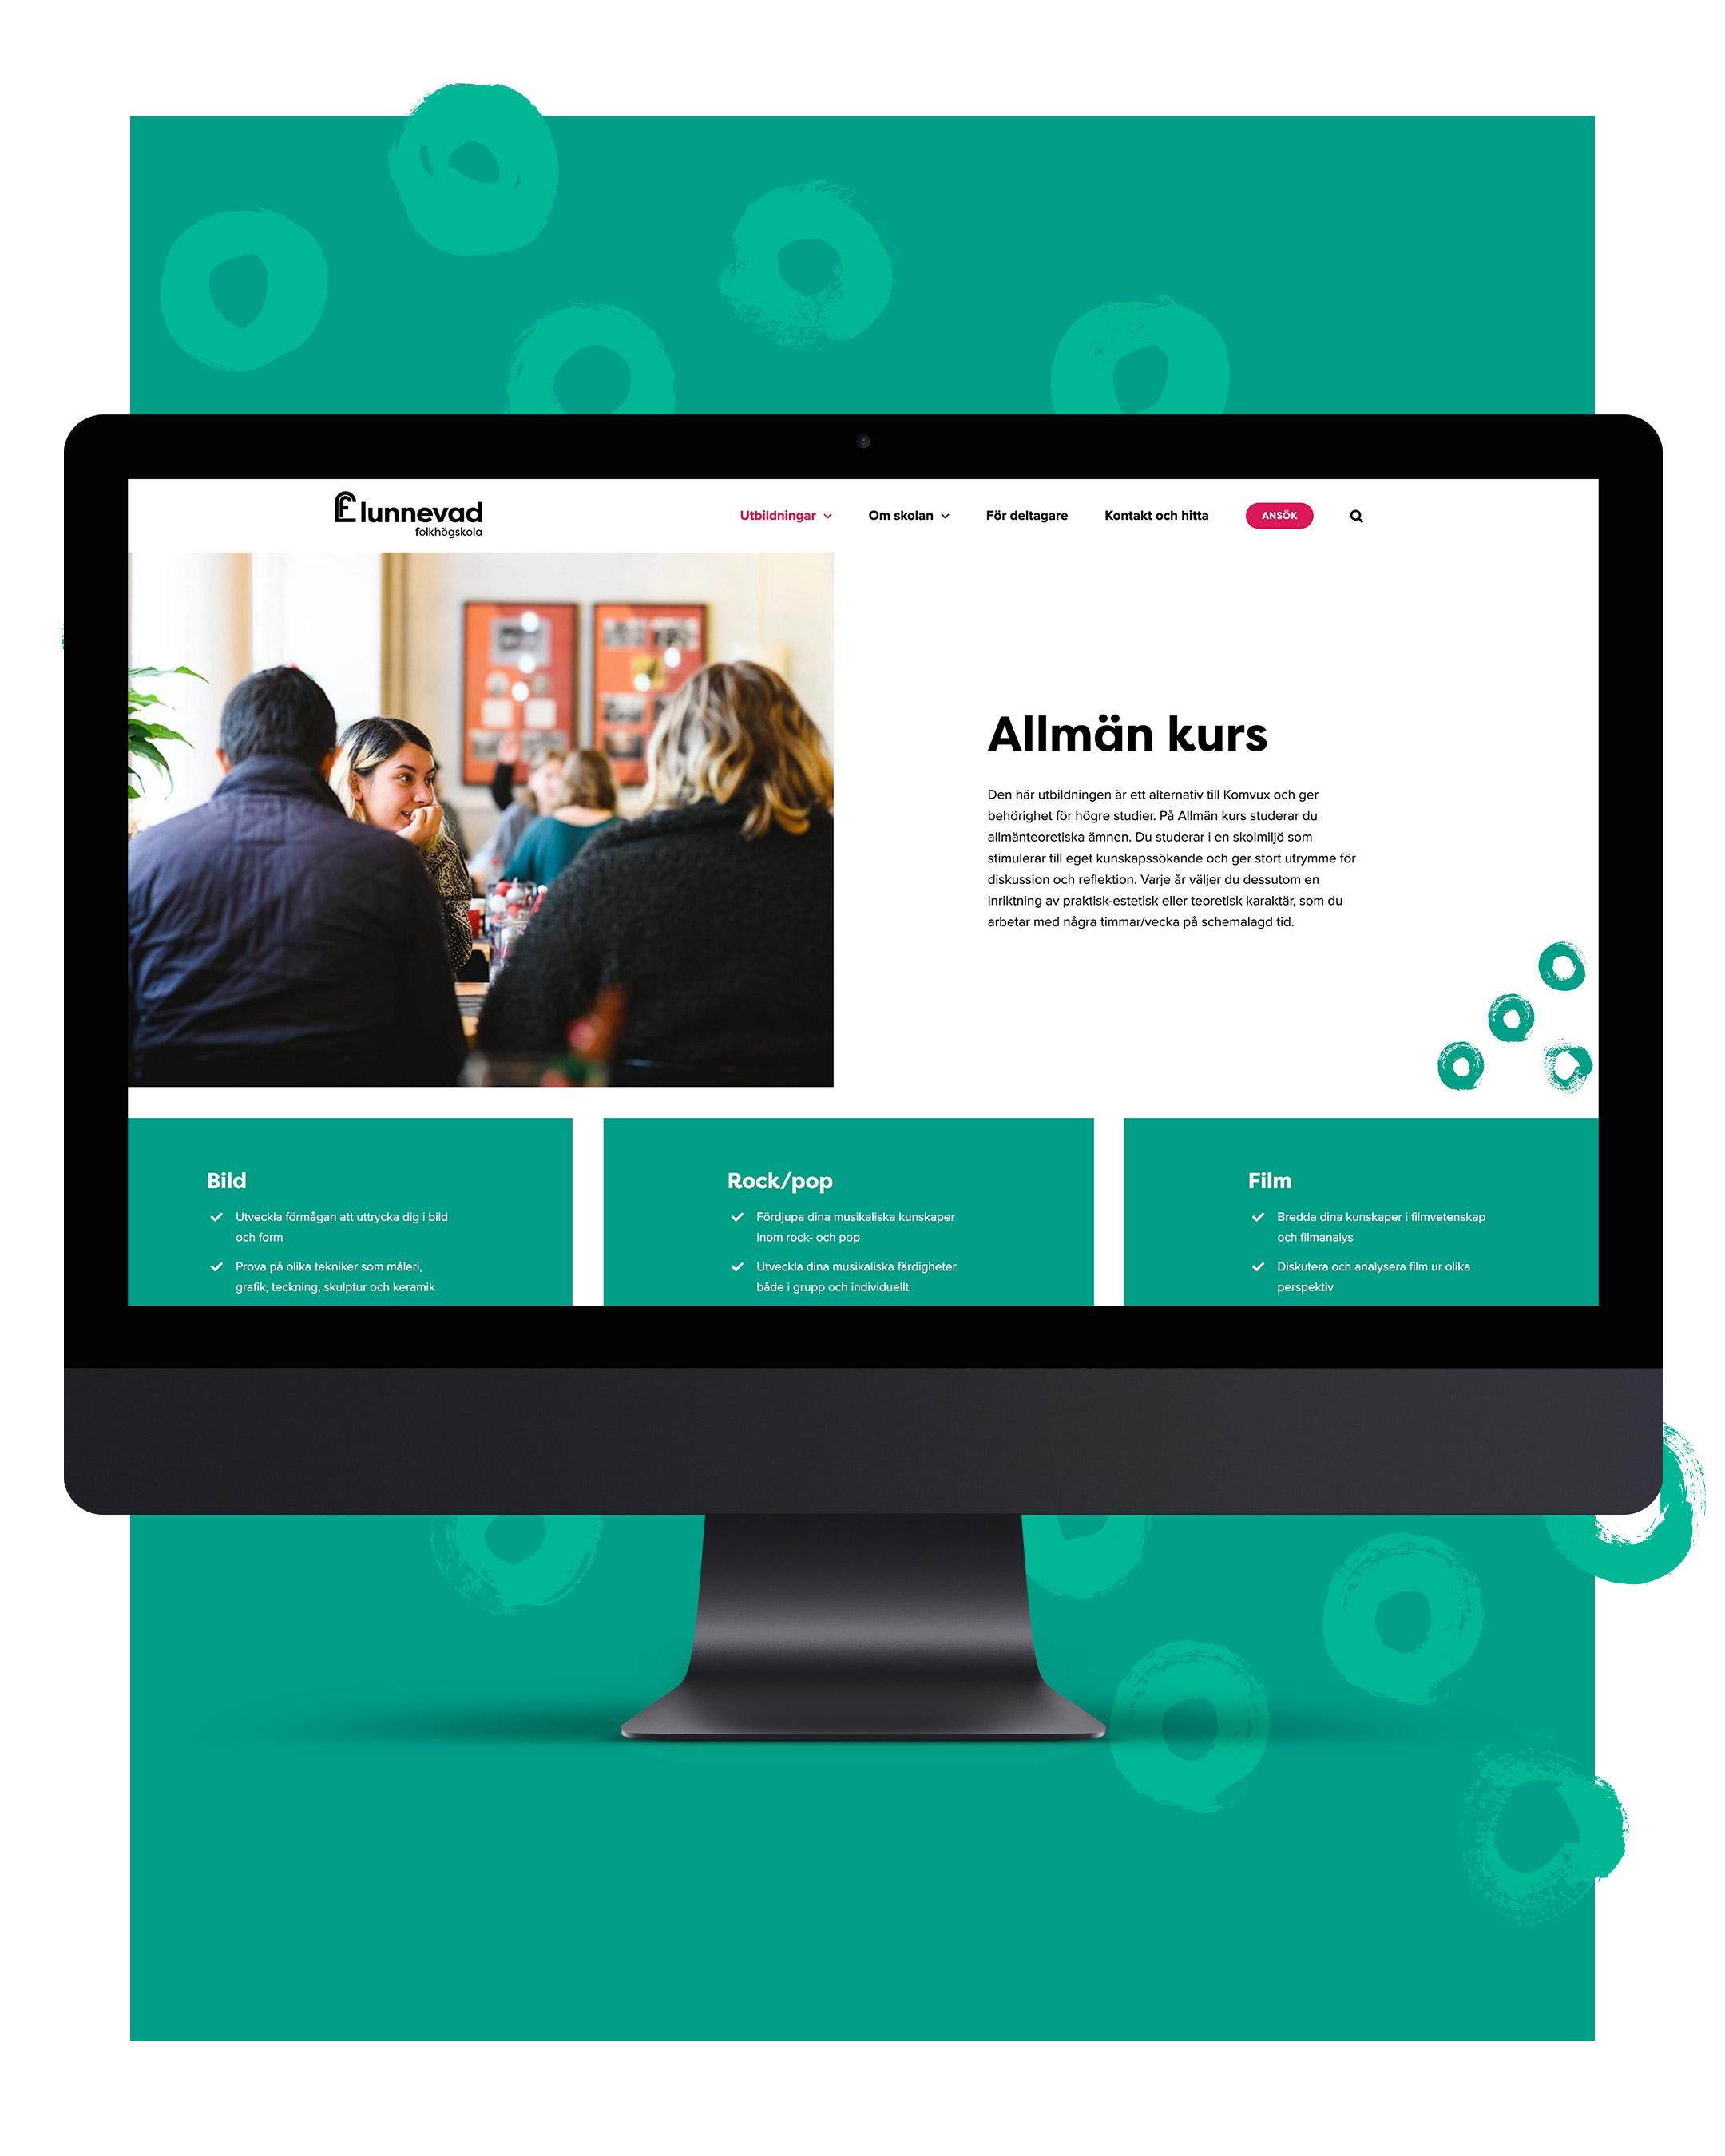 Lunnevad folkhögskolas nya hemsida